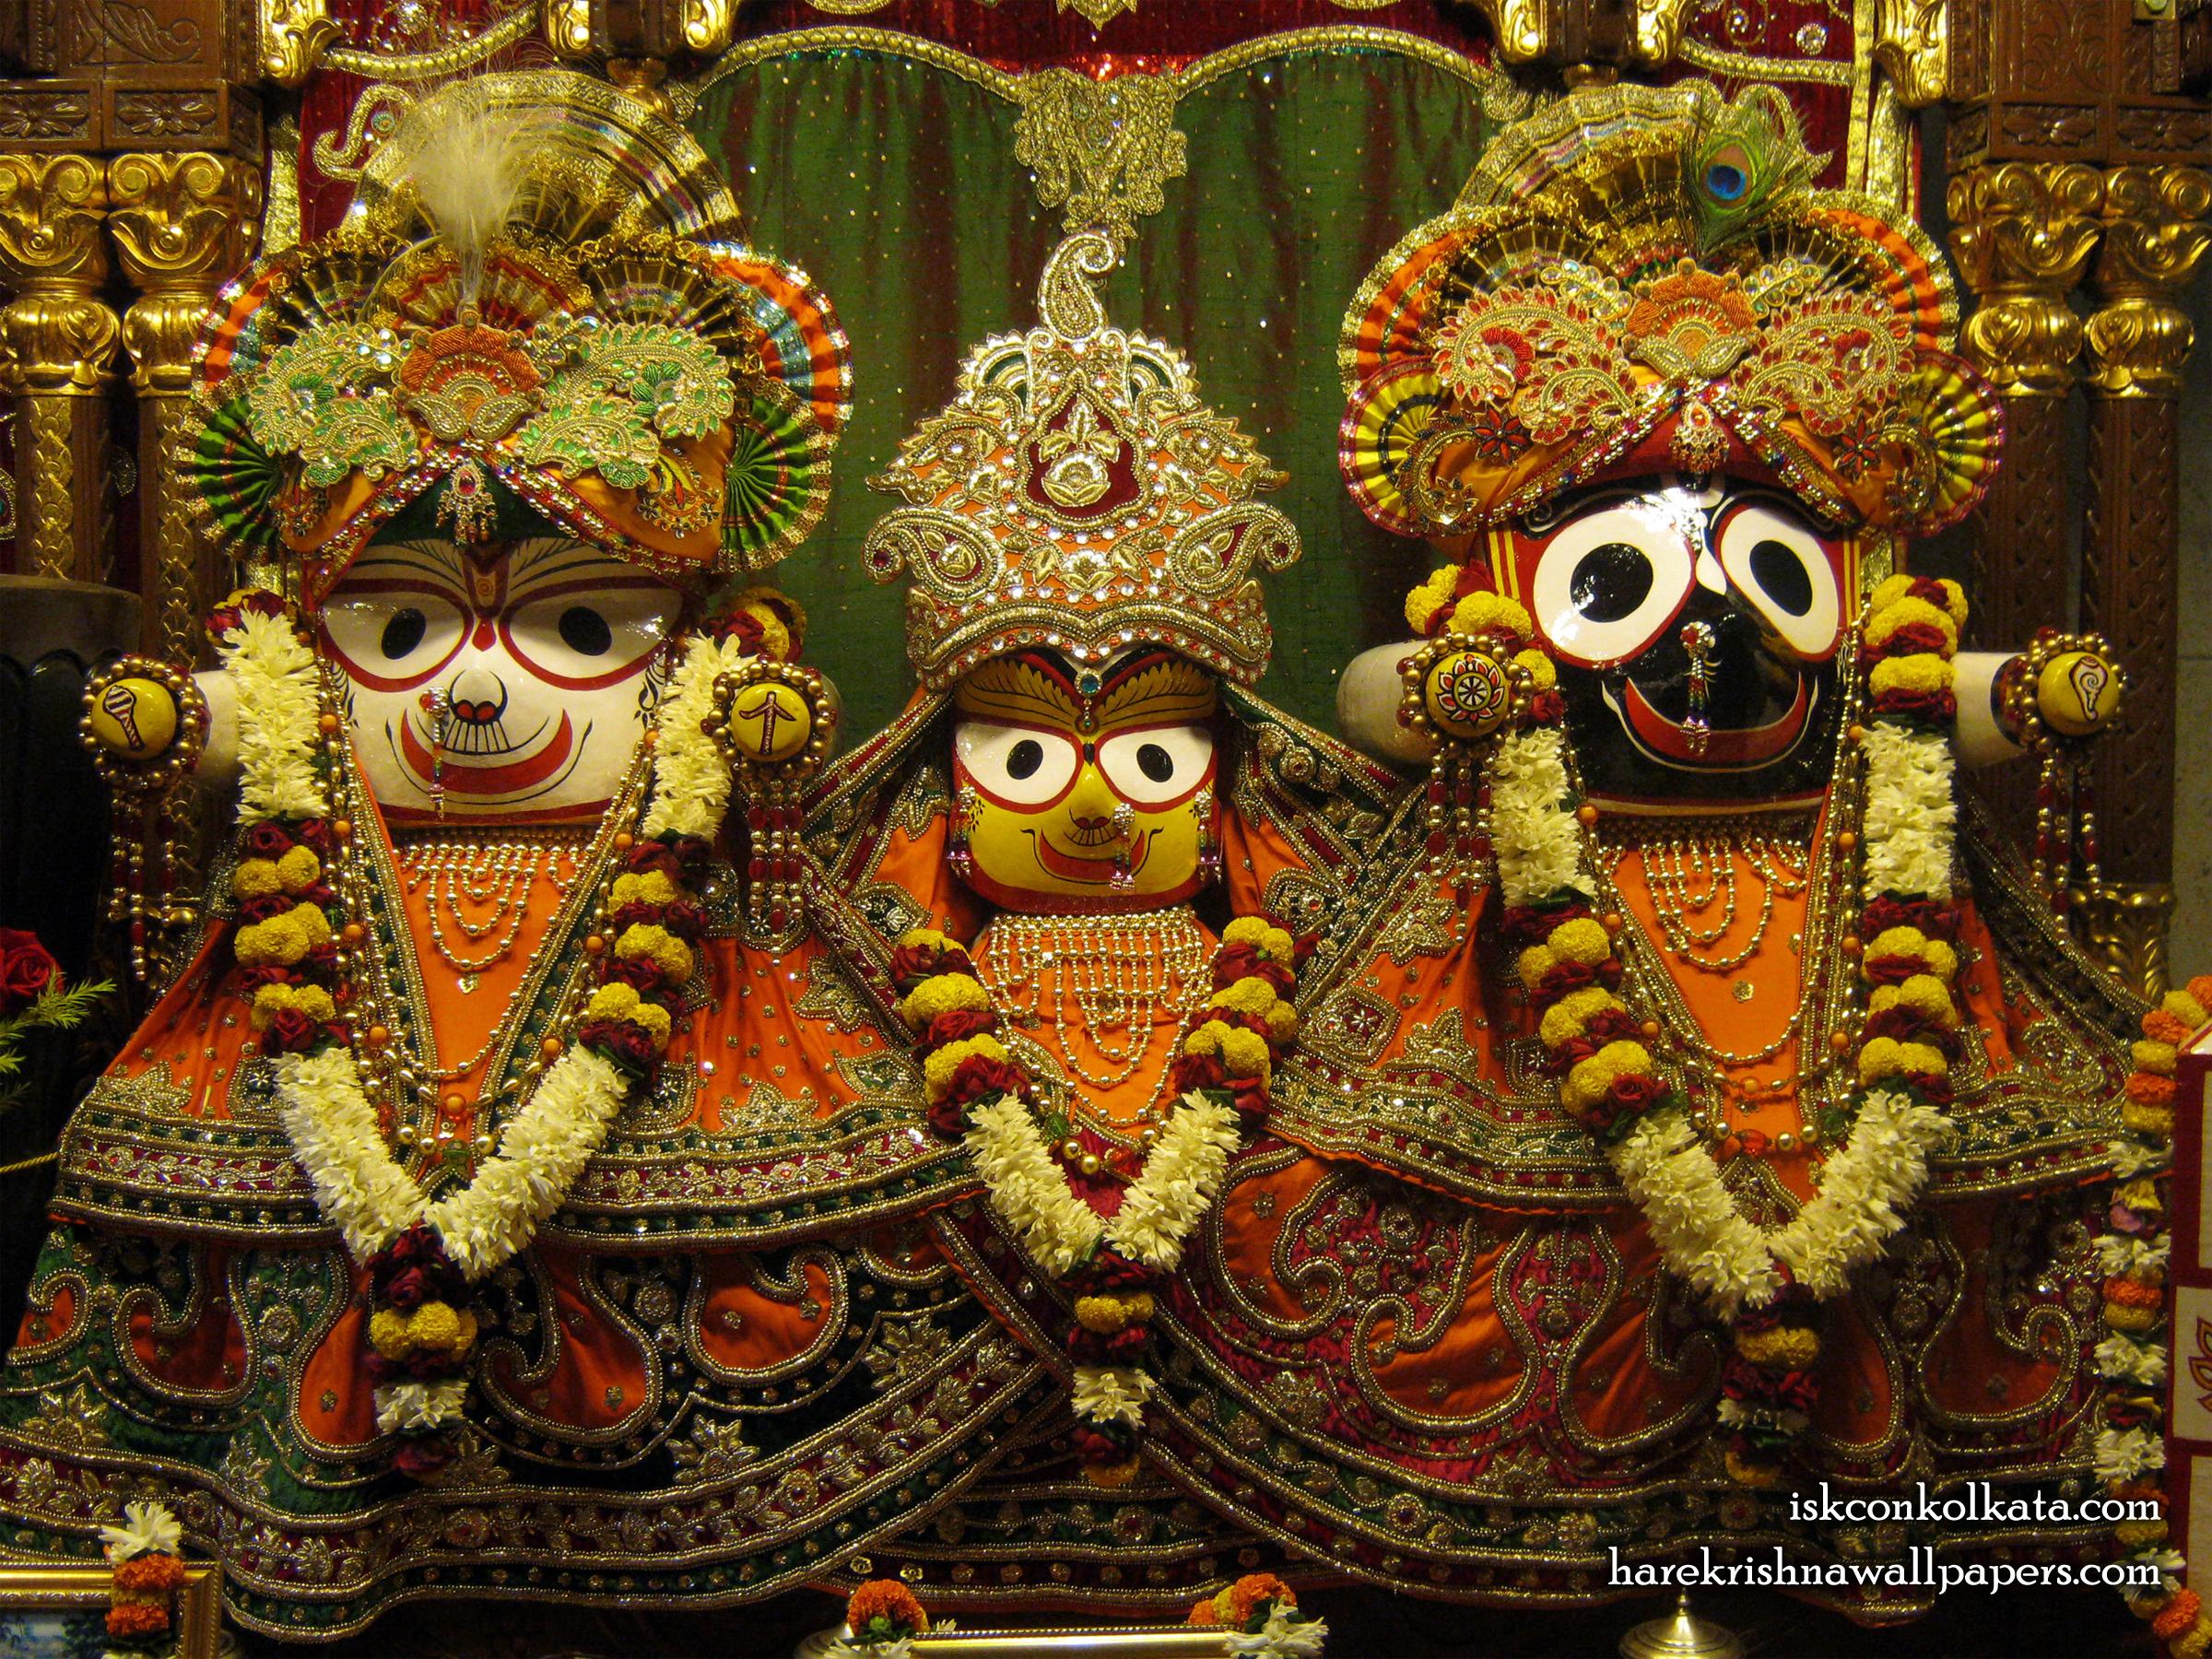 Jagannath Baladeva Subhadra Wallpaper (001) Size 2400x1800 Download